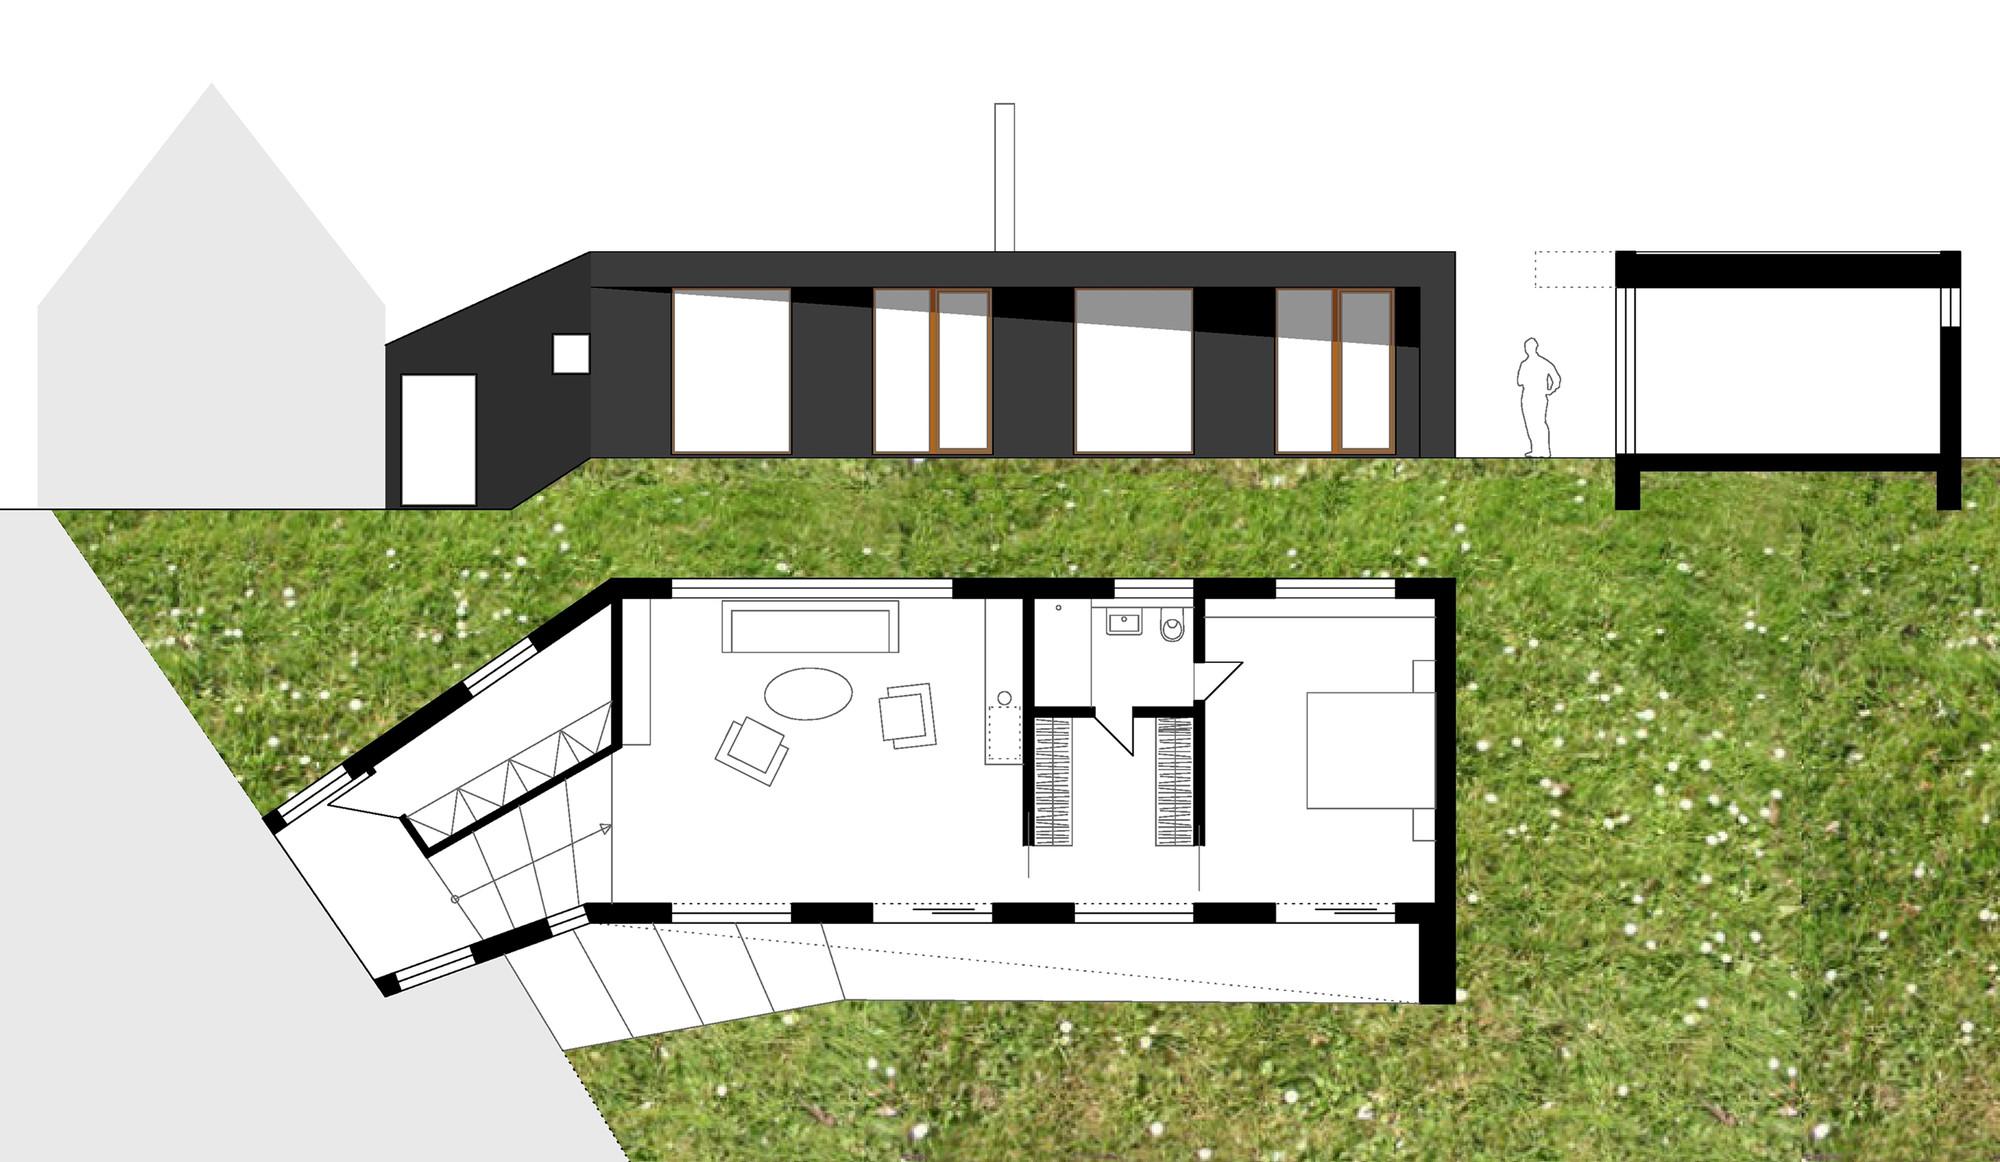 Floor Plan, Elevation, Section